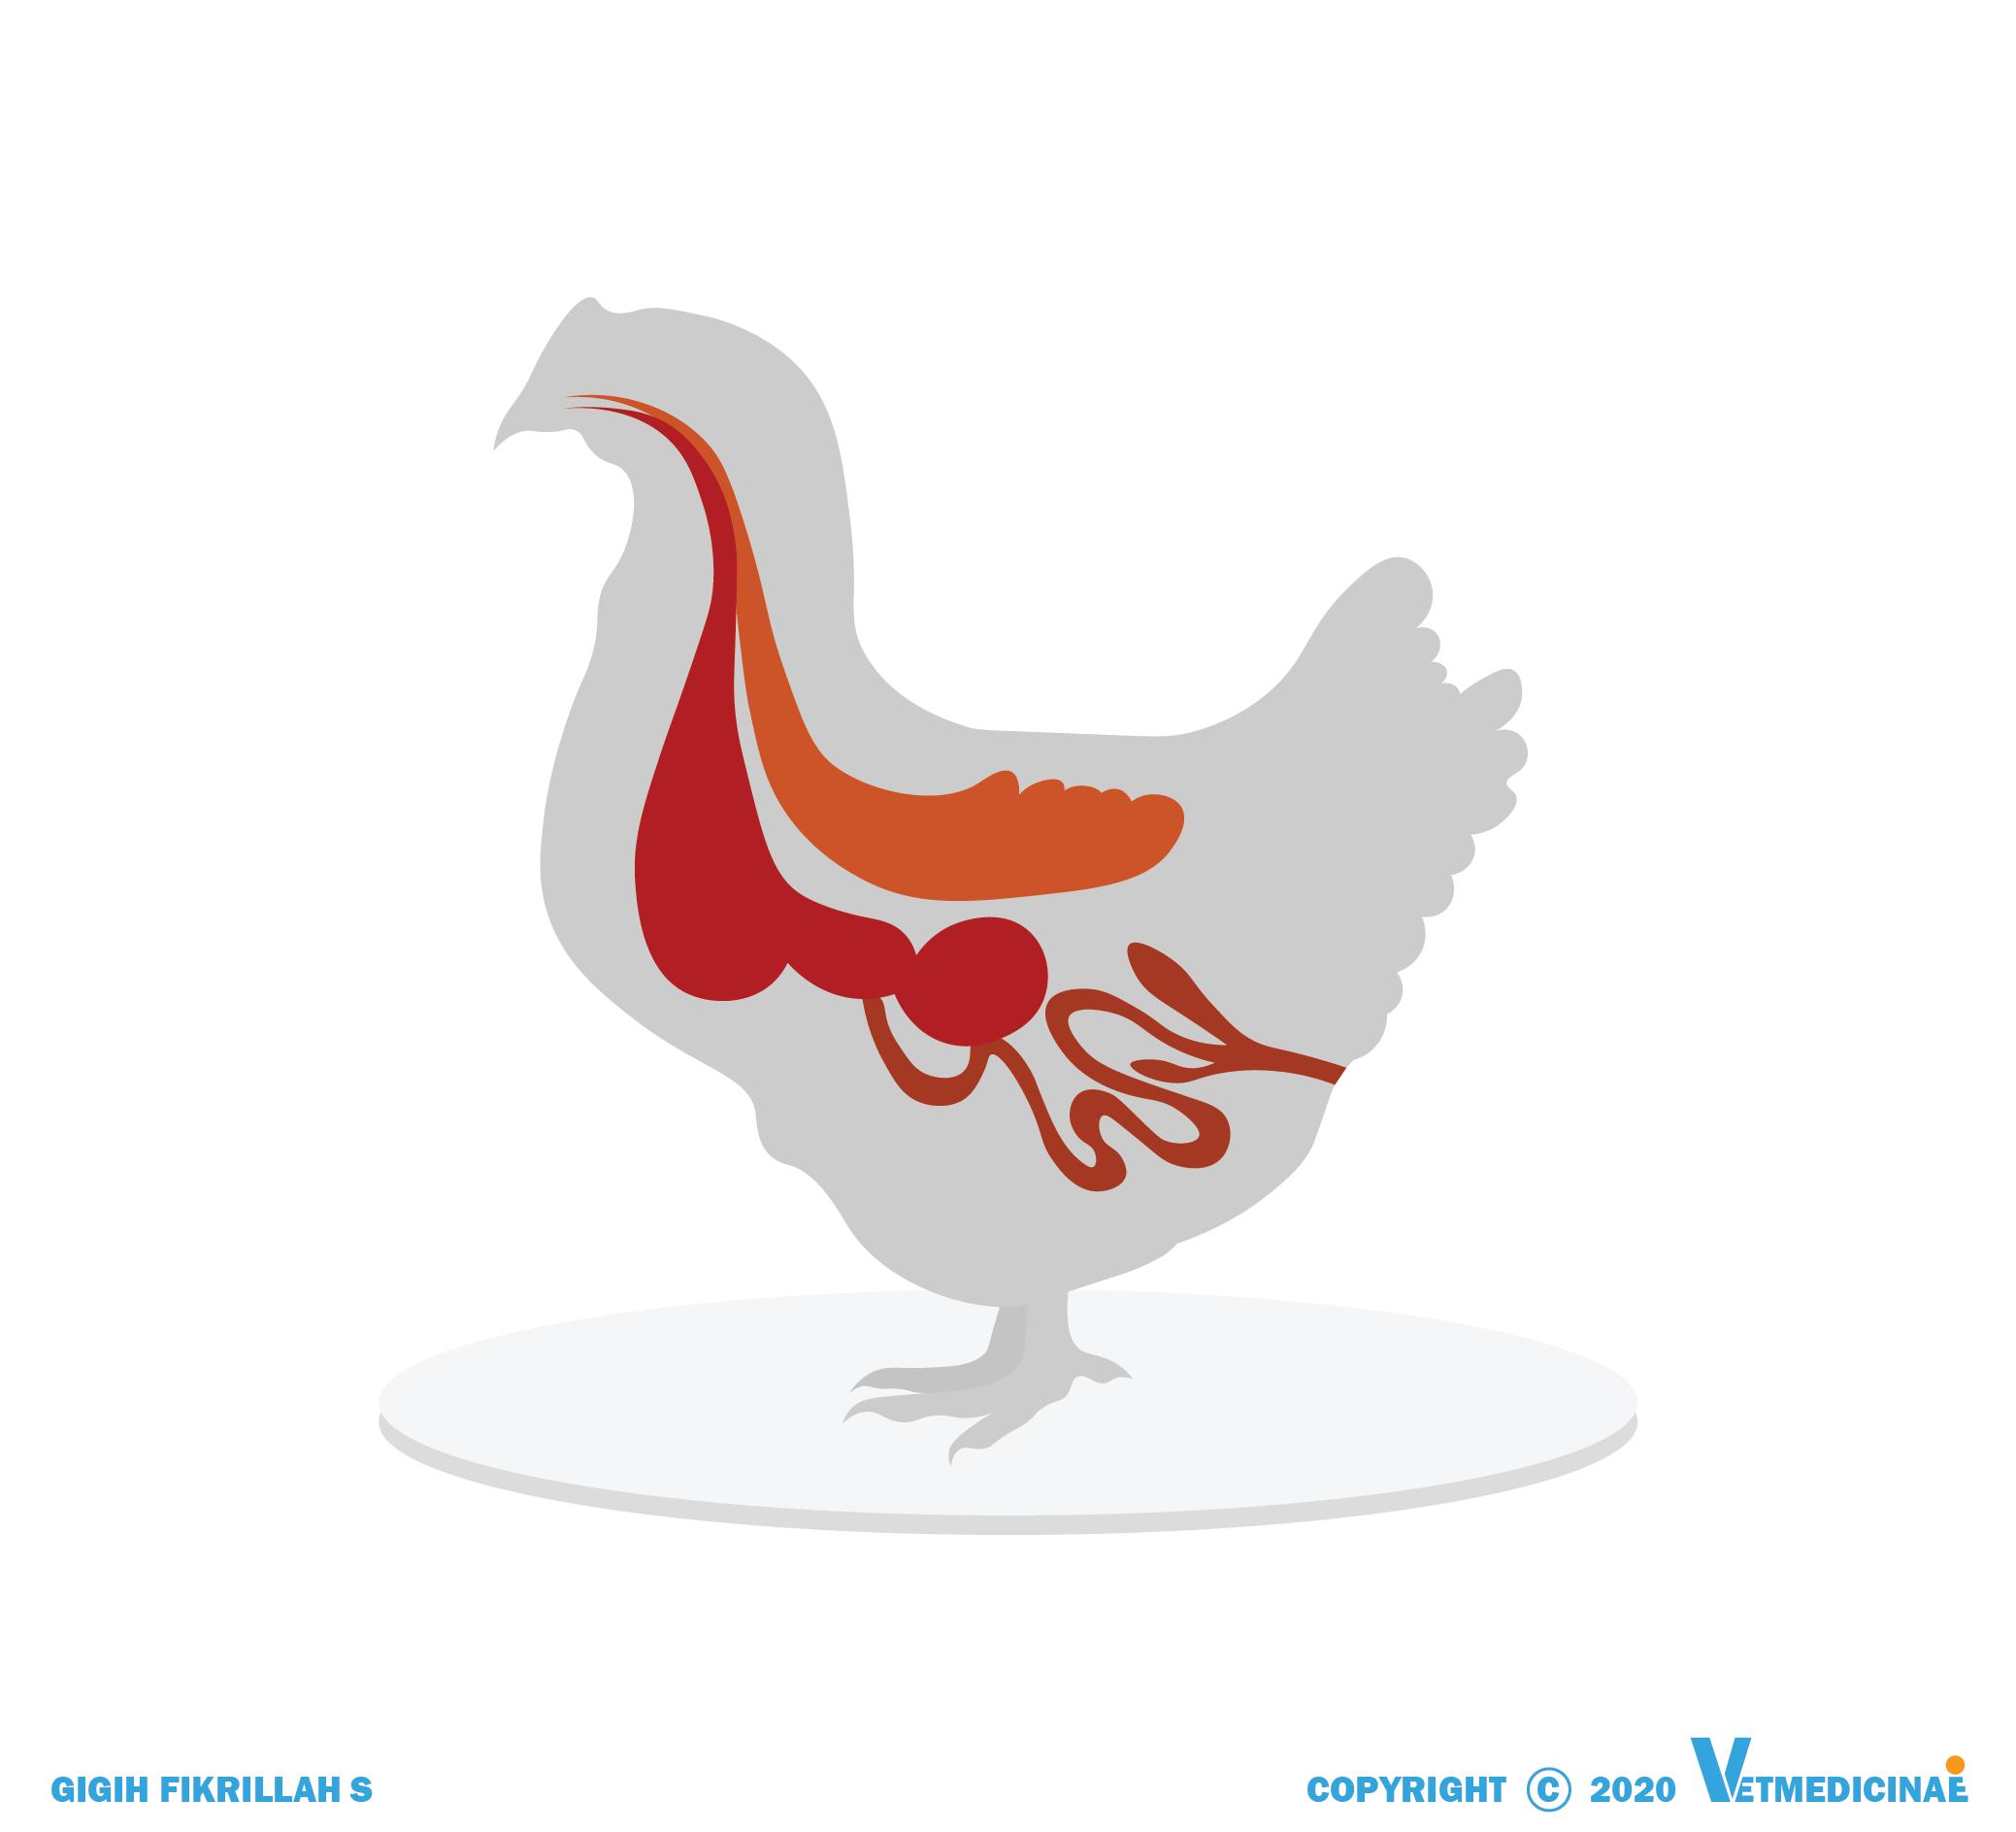 organ sistem pencernaan ayam